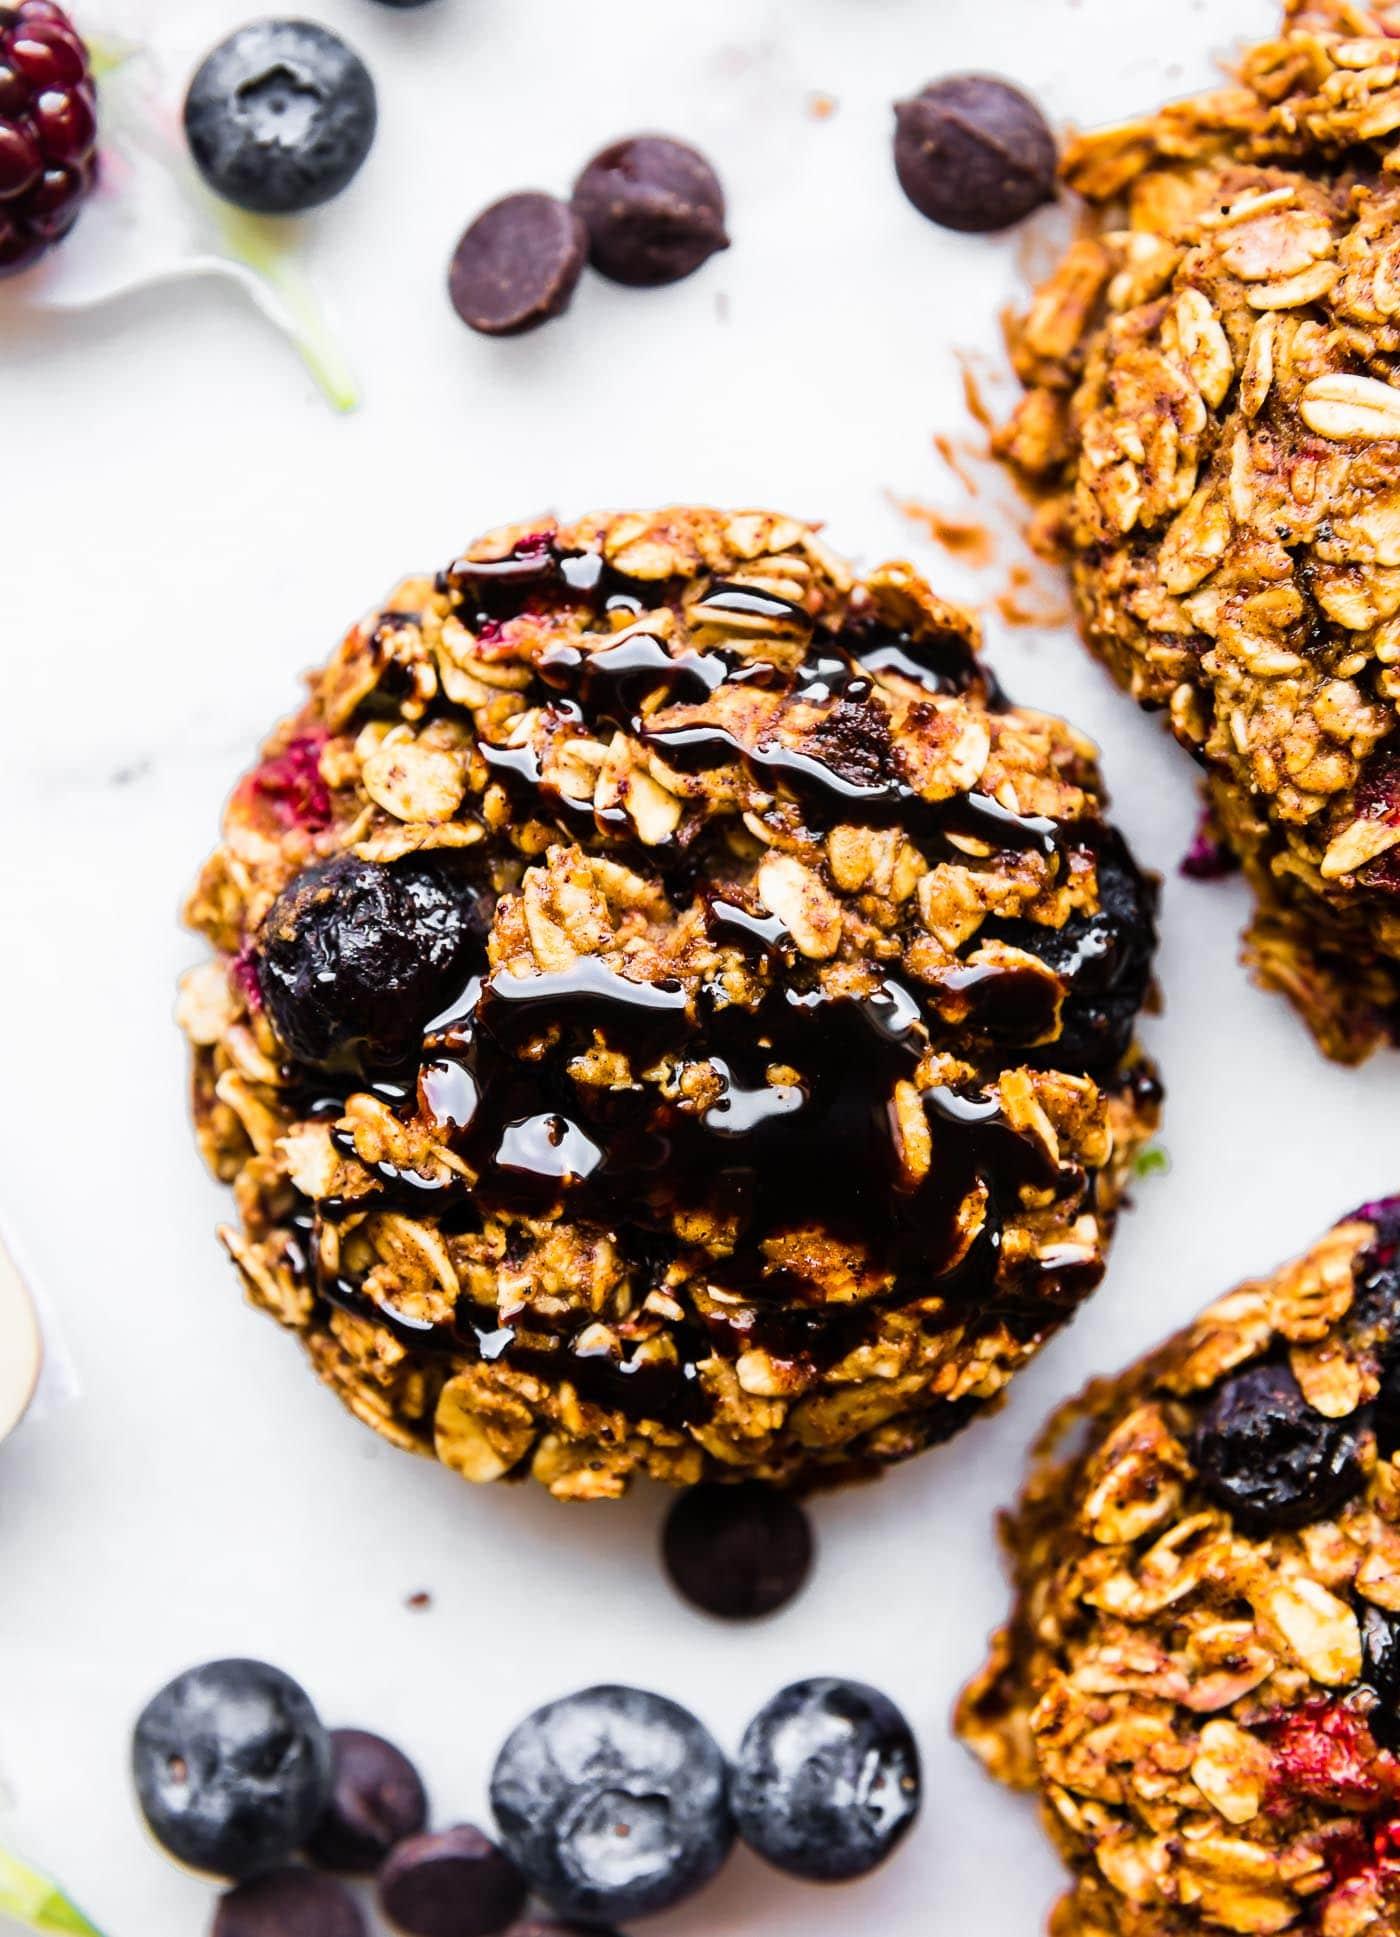 ONE BOWLGluten Free BerryOatmeal Breakfast Cookies with dark chocolate